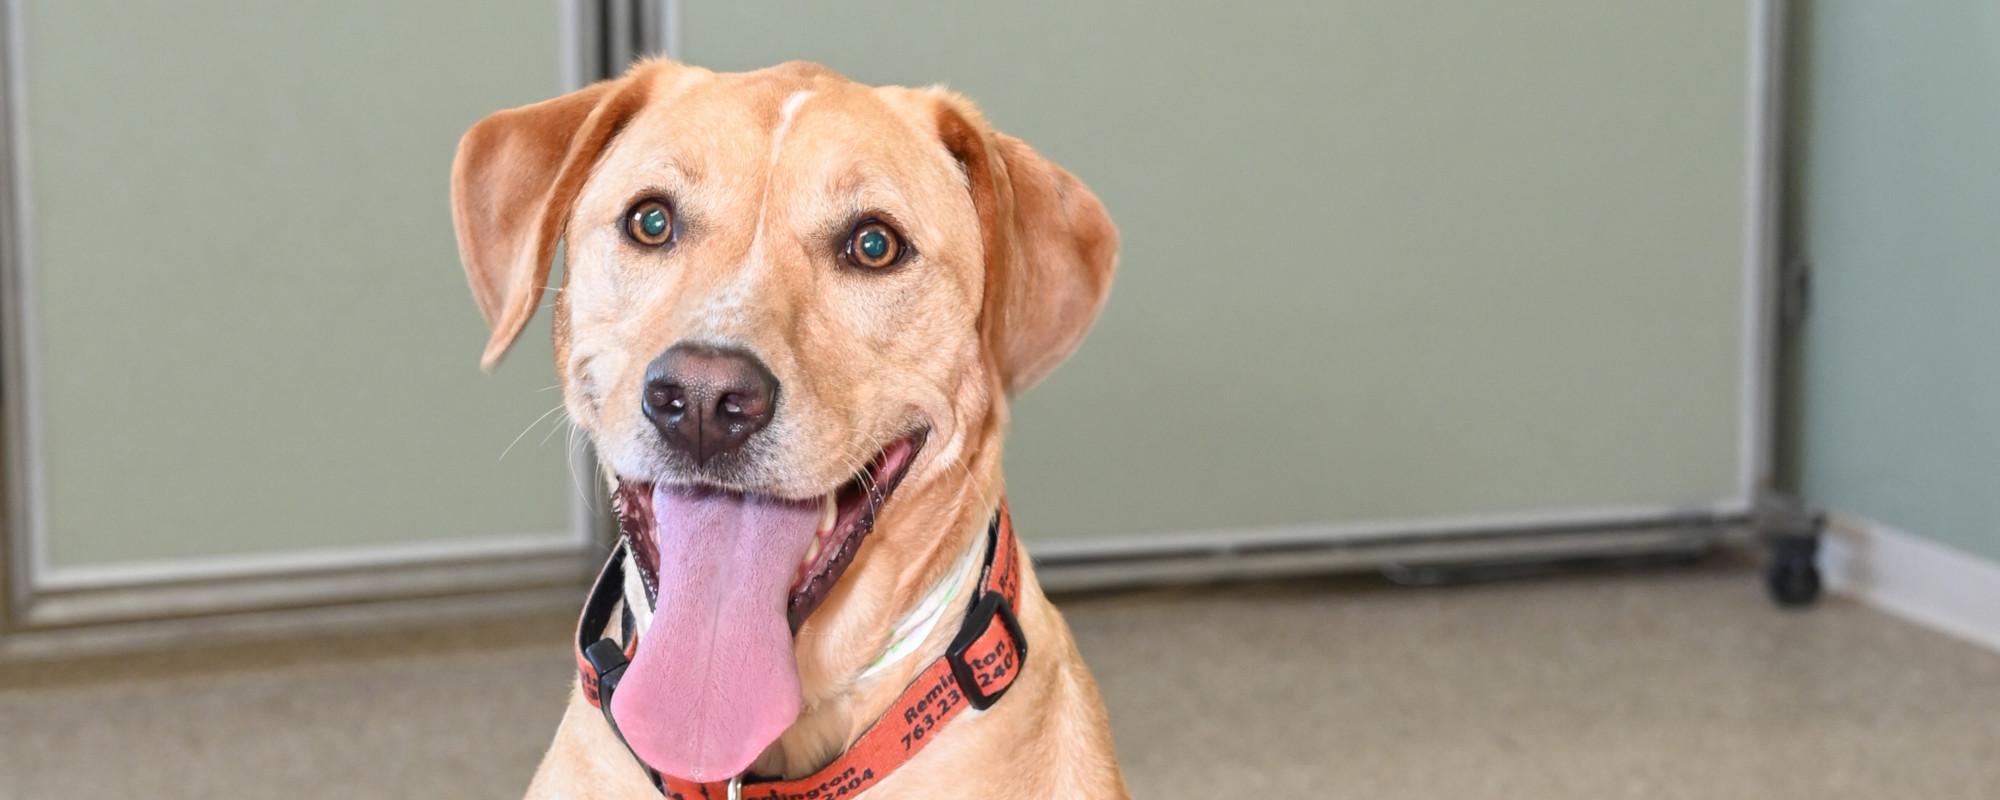 Pet Hotel For Pets In Zimmerman Mn Zimmerman Veterinary Clinic